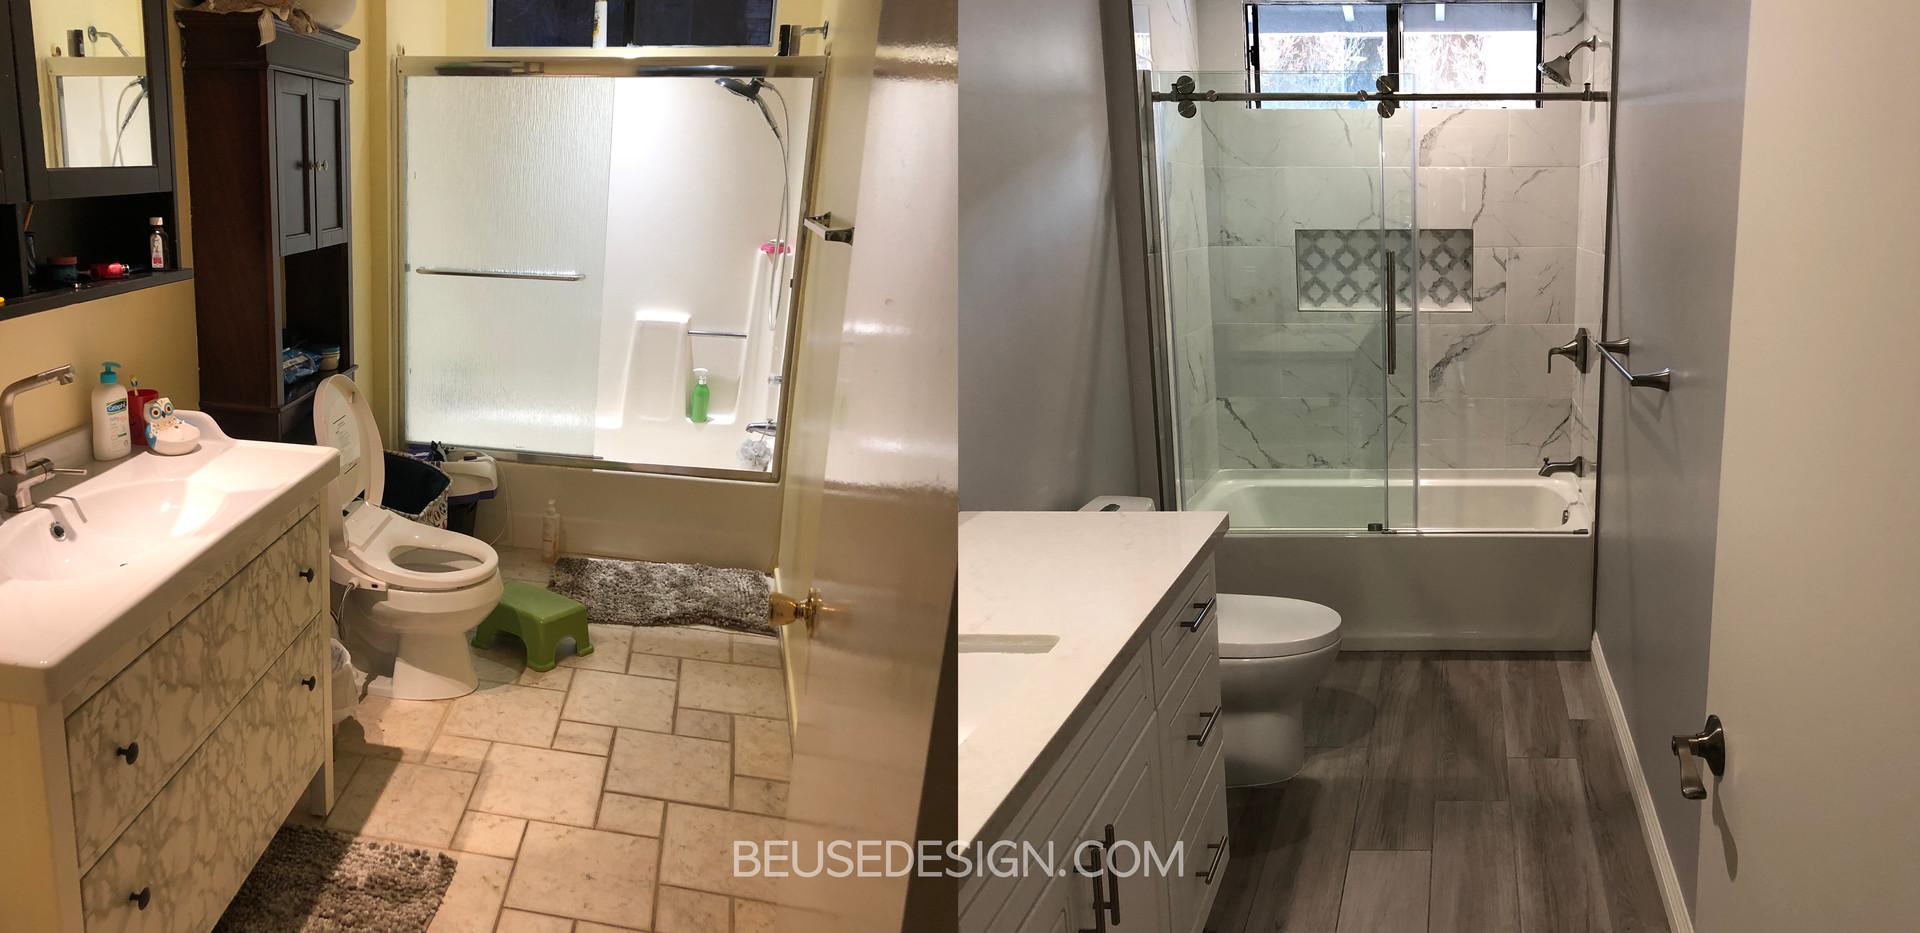 BA_Bathroom0120.jpg